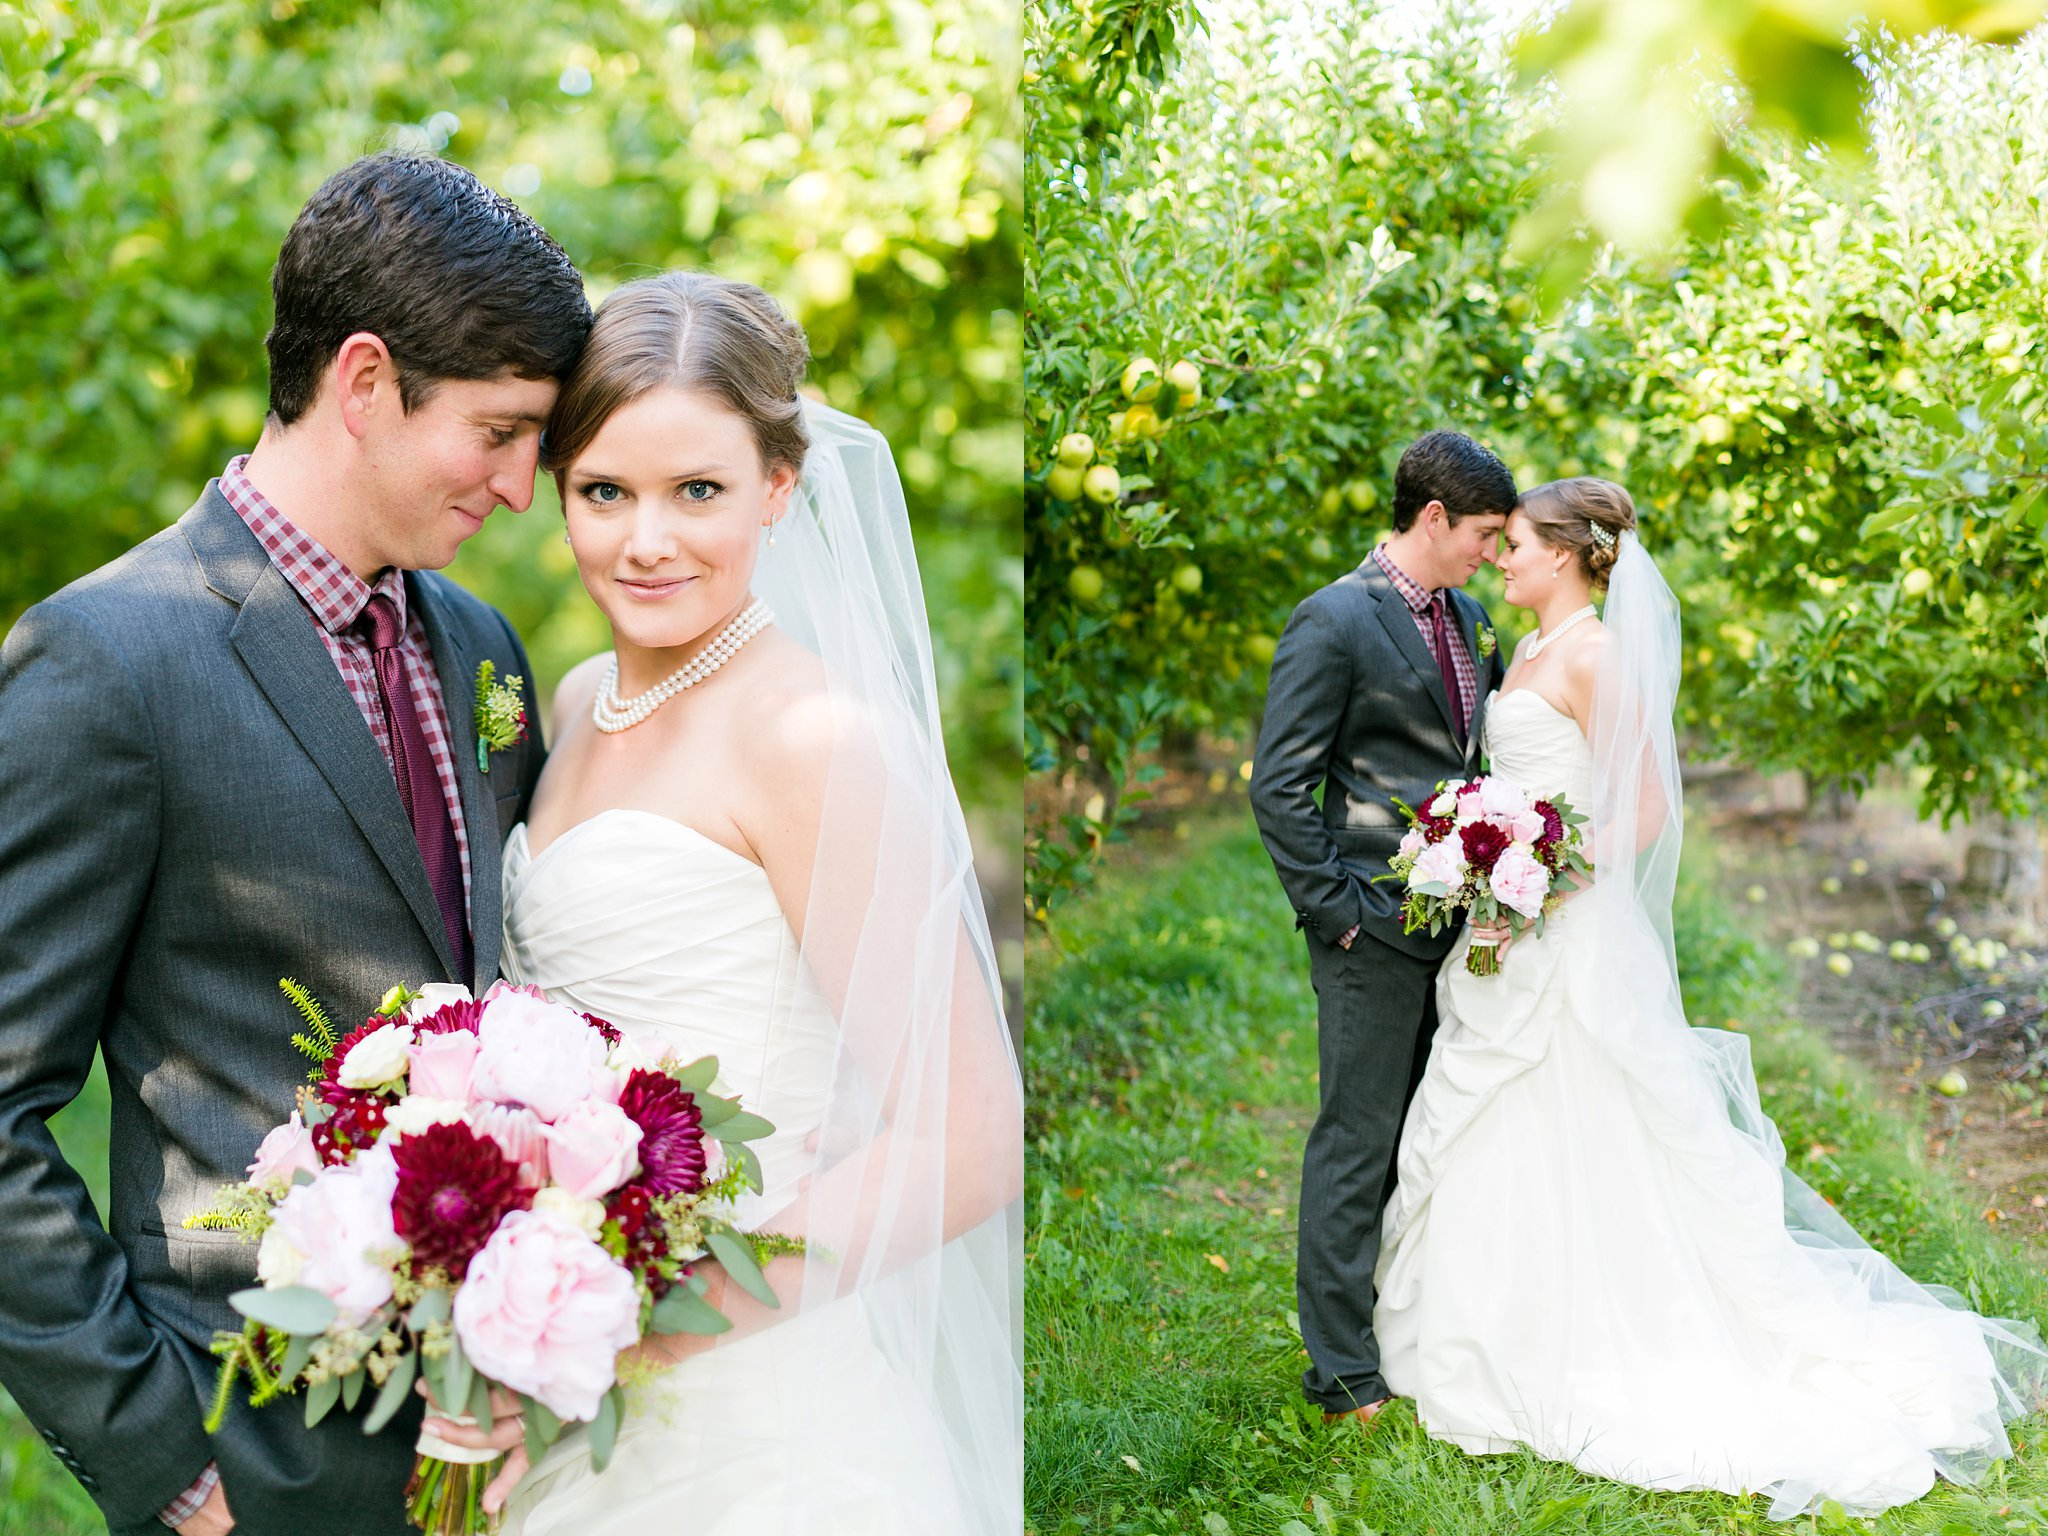 Chelan Washington Wedding Photos Megan Kelsey Photography Delight Wedding Workshop Styled Shoot Annalee & Scot-92.jpg